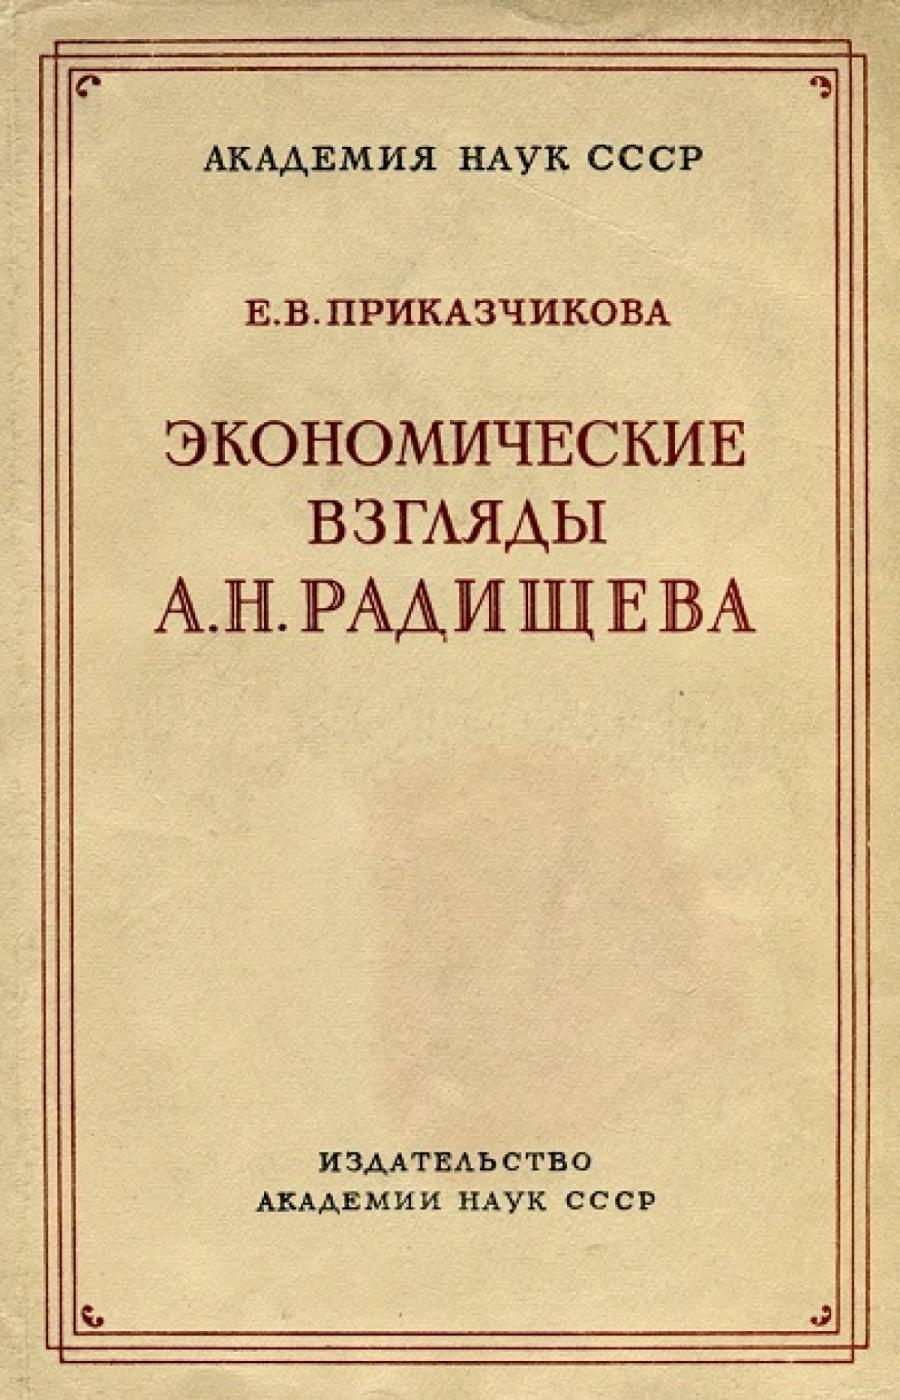 Обложка книги:  приказчикова елизавета васильевна - экономические взгляды а. н. радищева